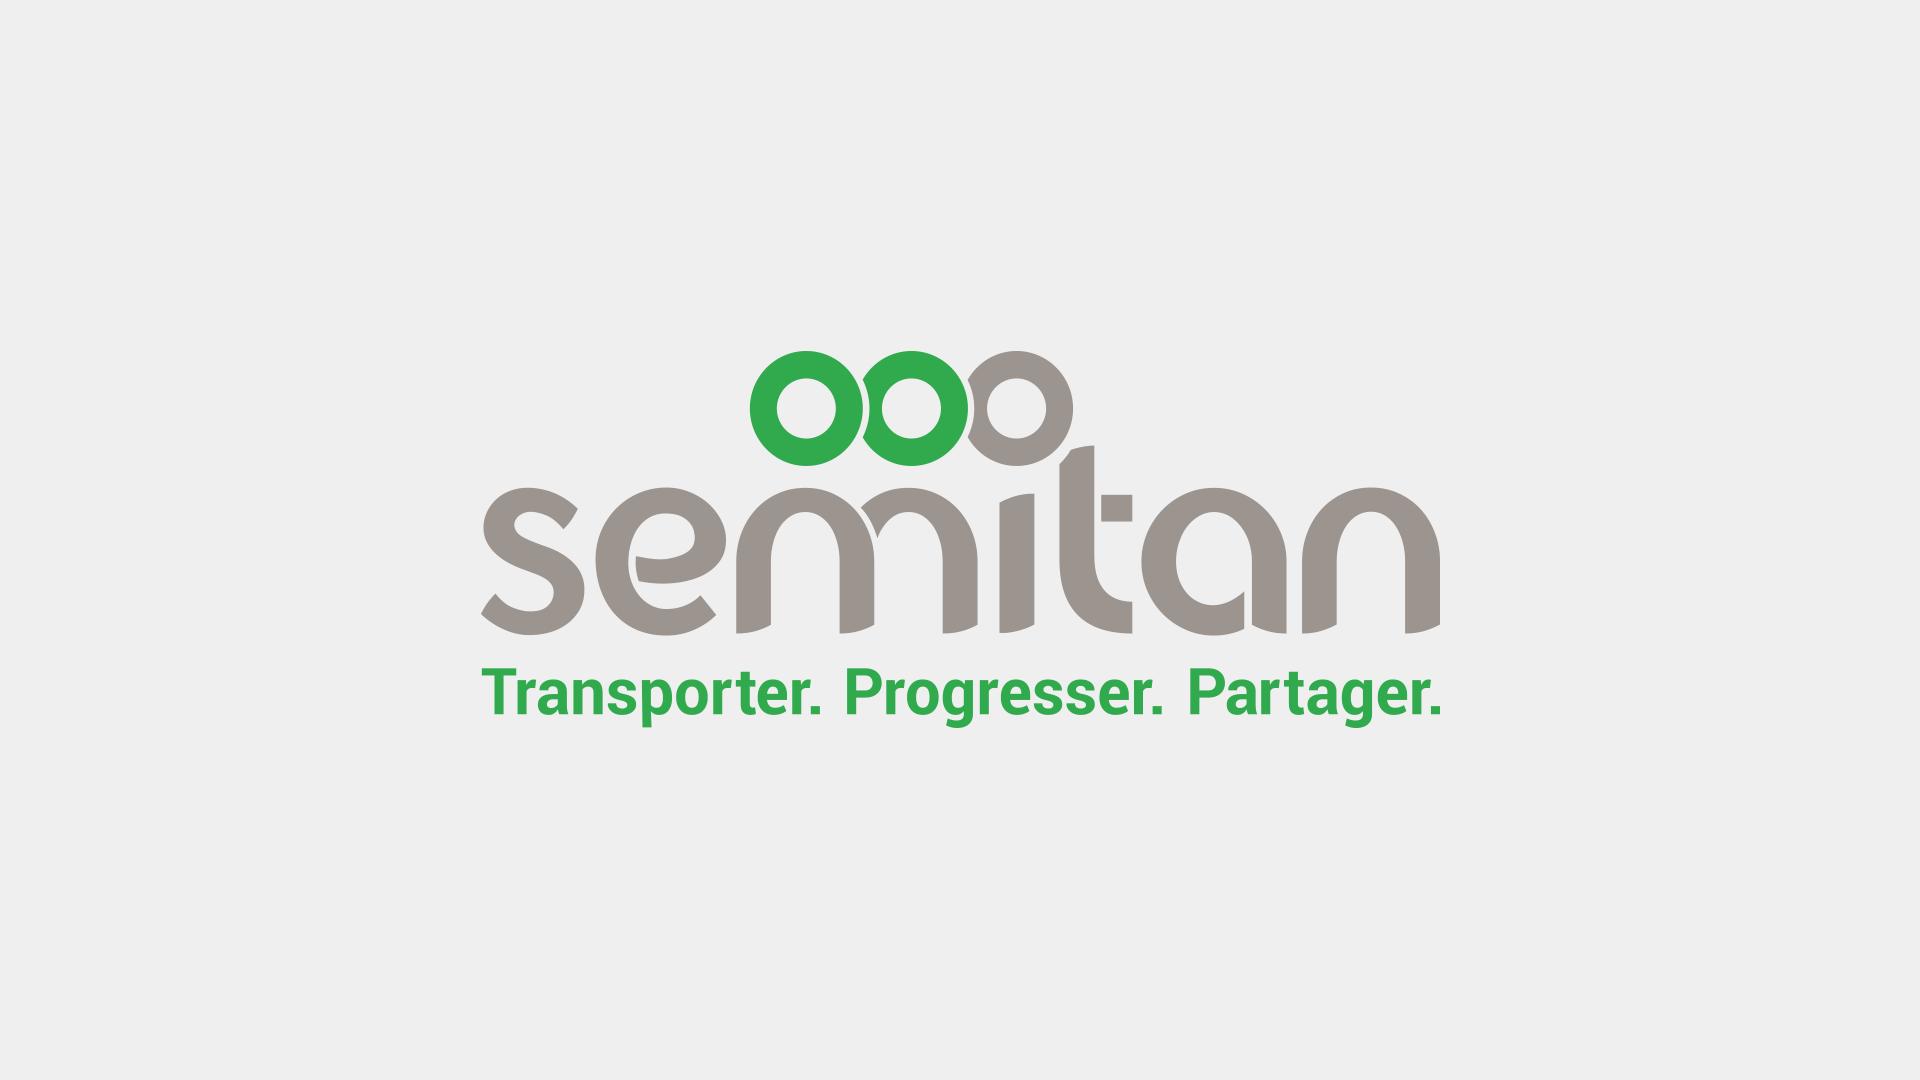 Semitan_1920x1080px